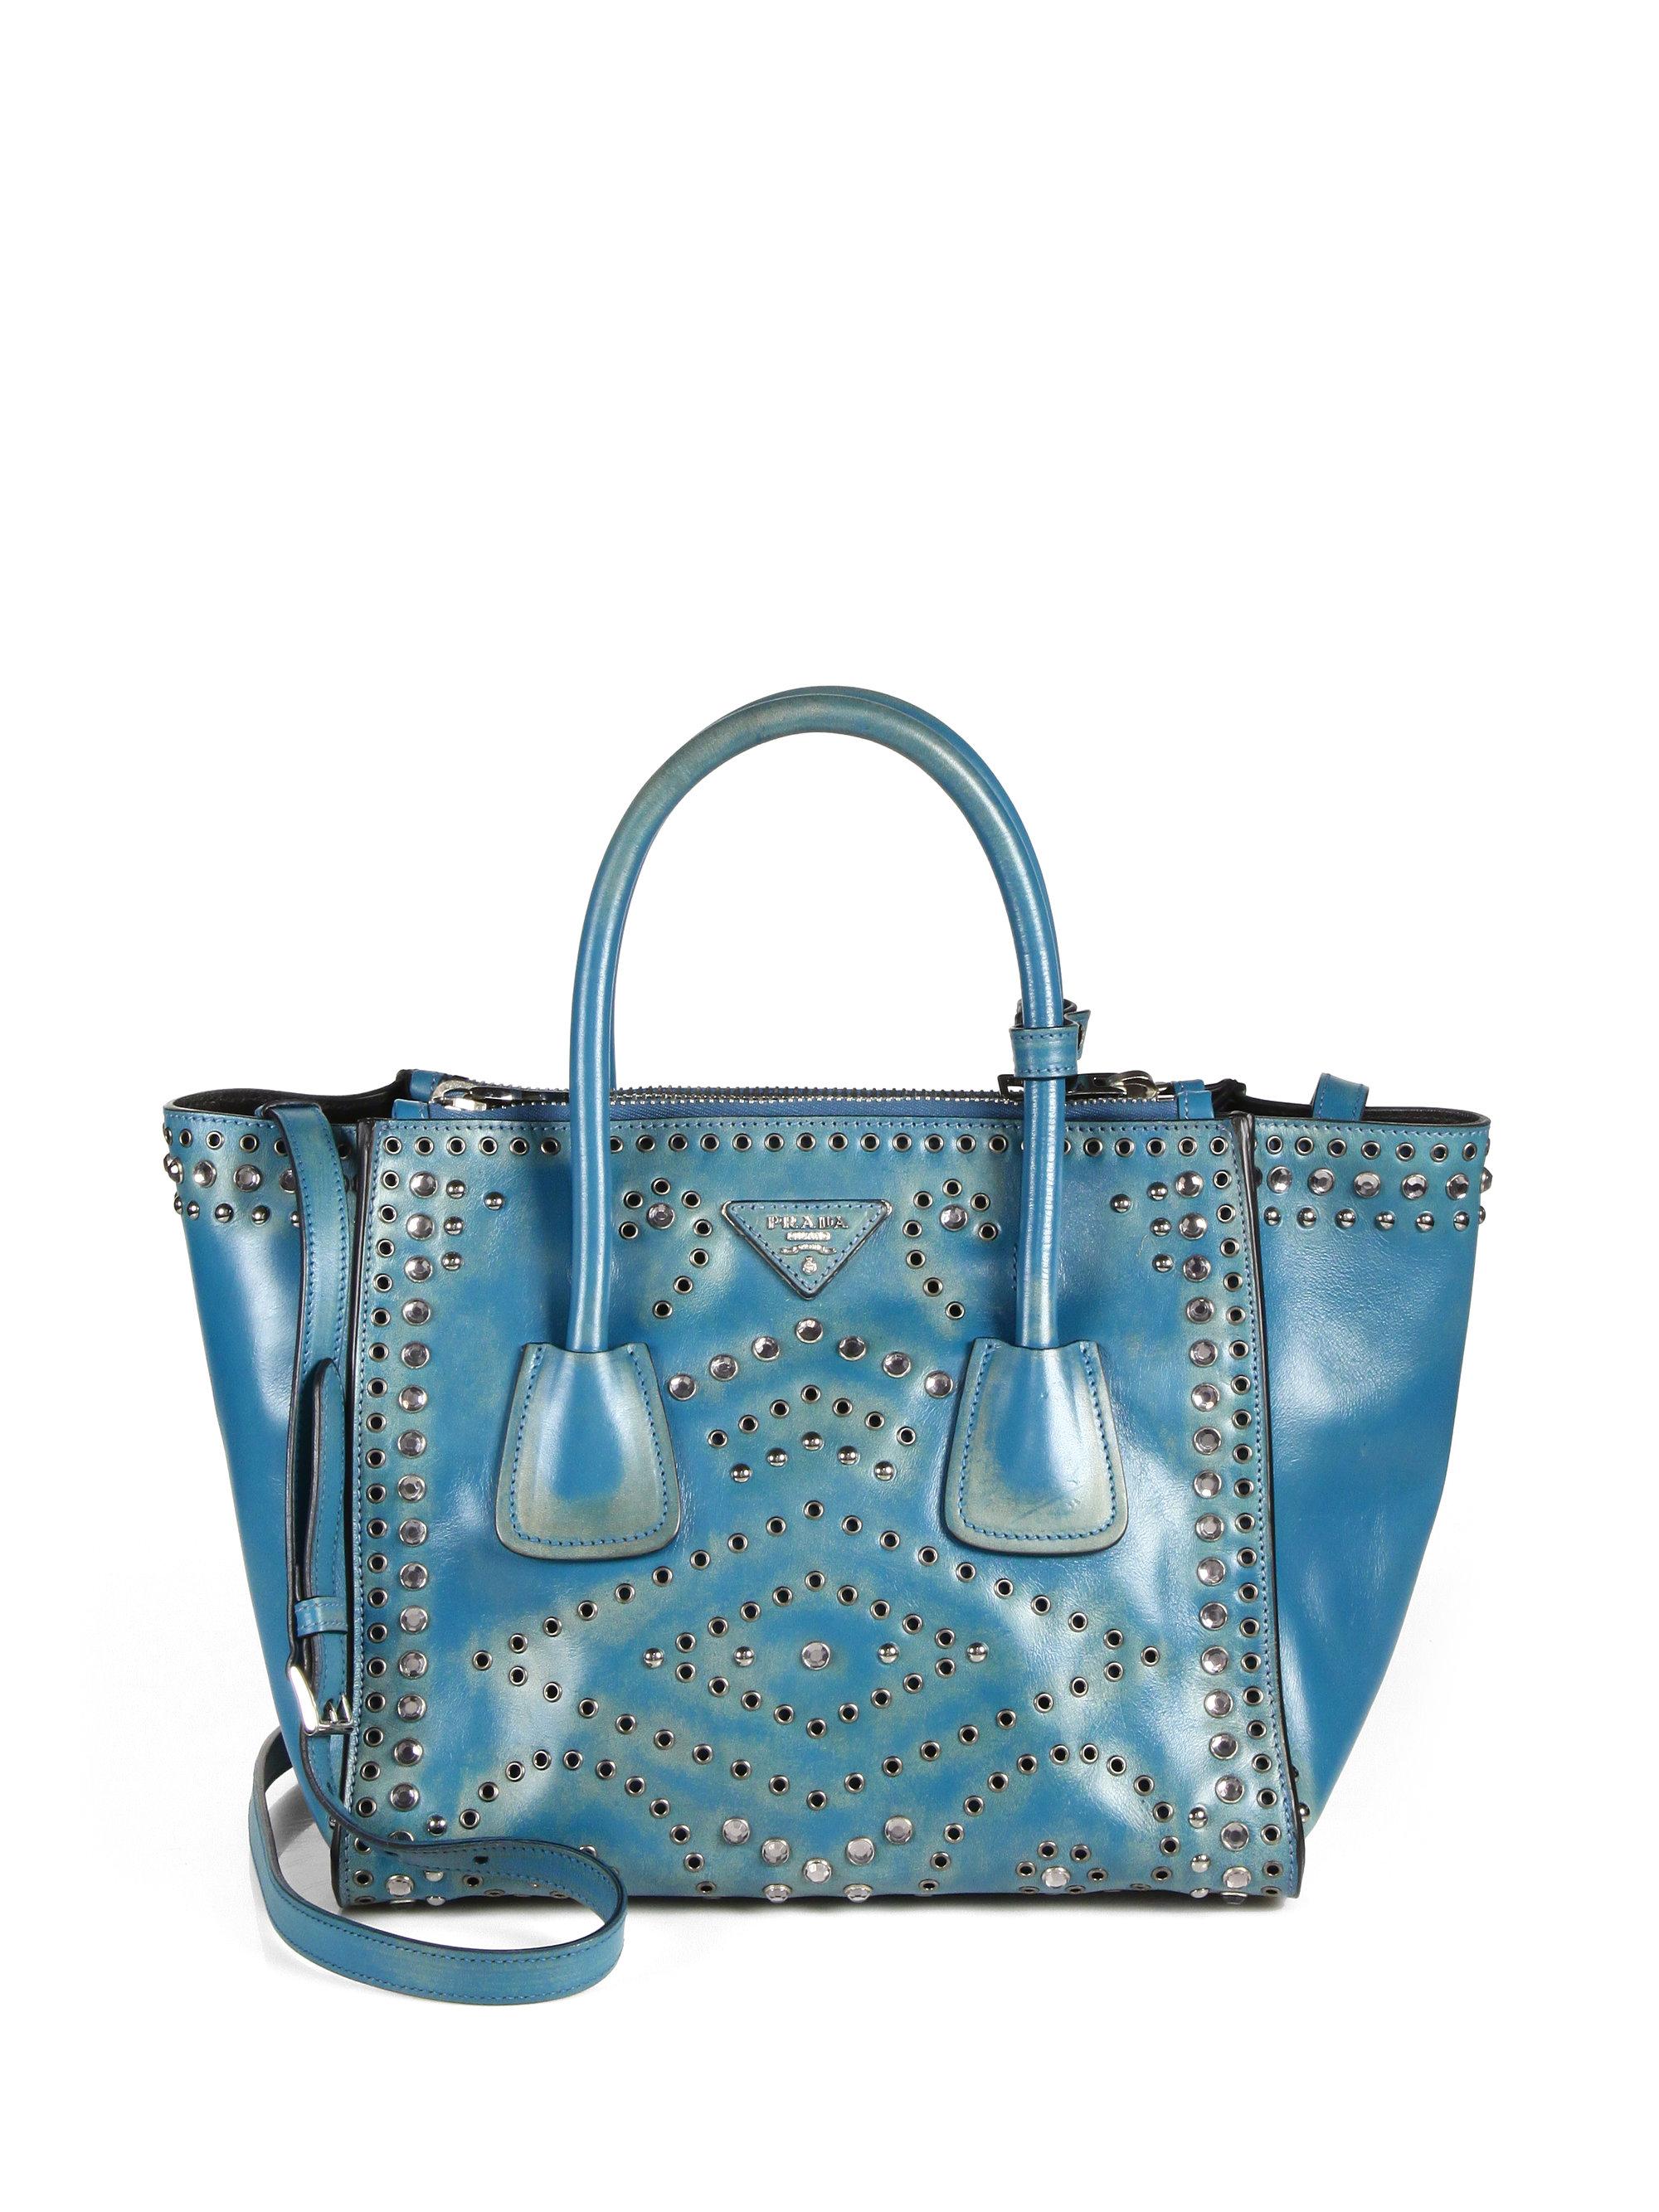 ... Daino Single Strap Tote Bag in Black  size 40 b81c4 49614 Prada Vitello  Vintage Embellished Tote in Blue - Lyst ... 4dd58ef6e1